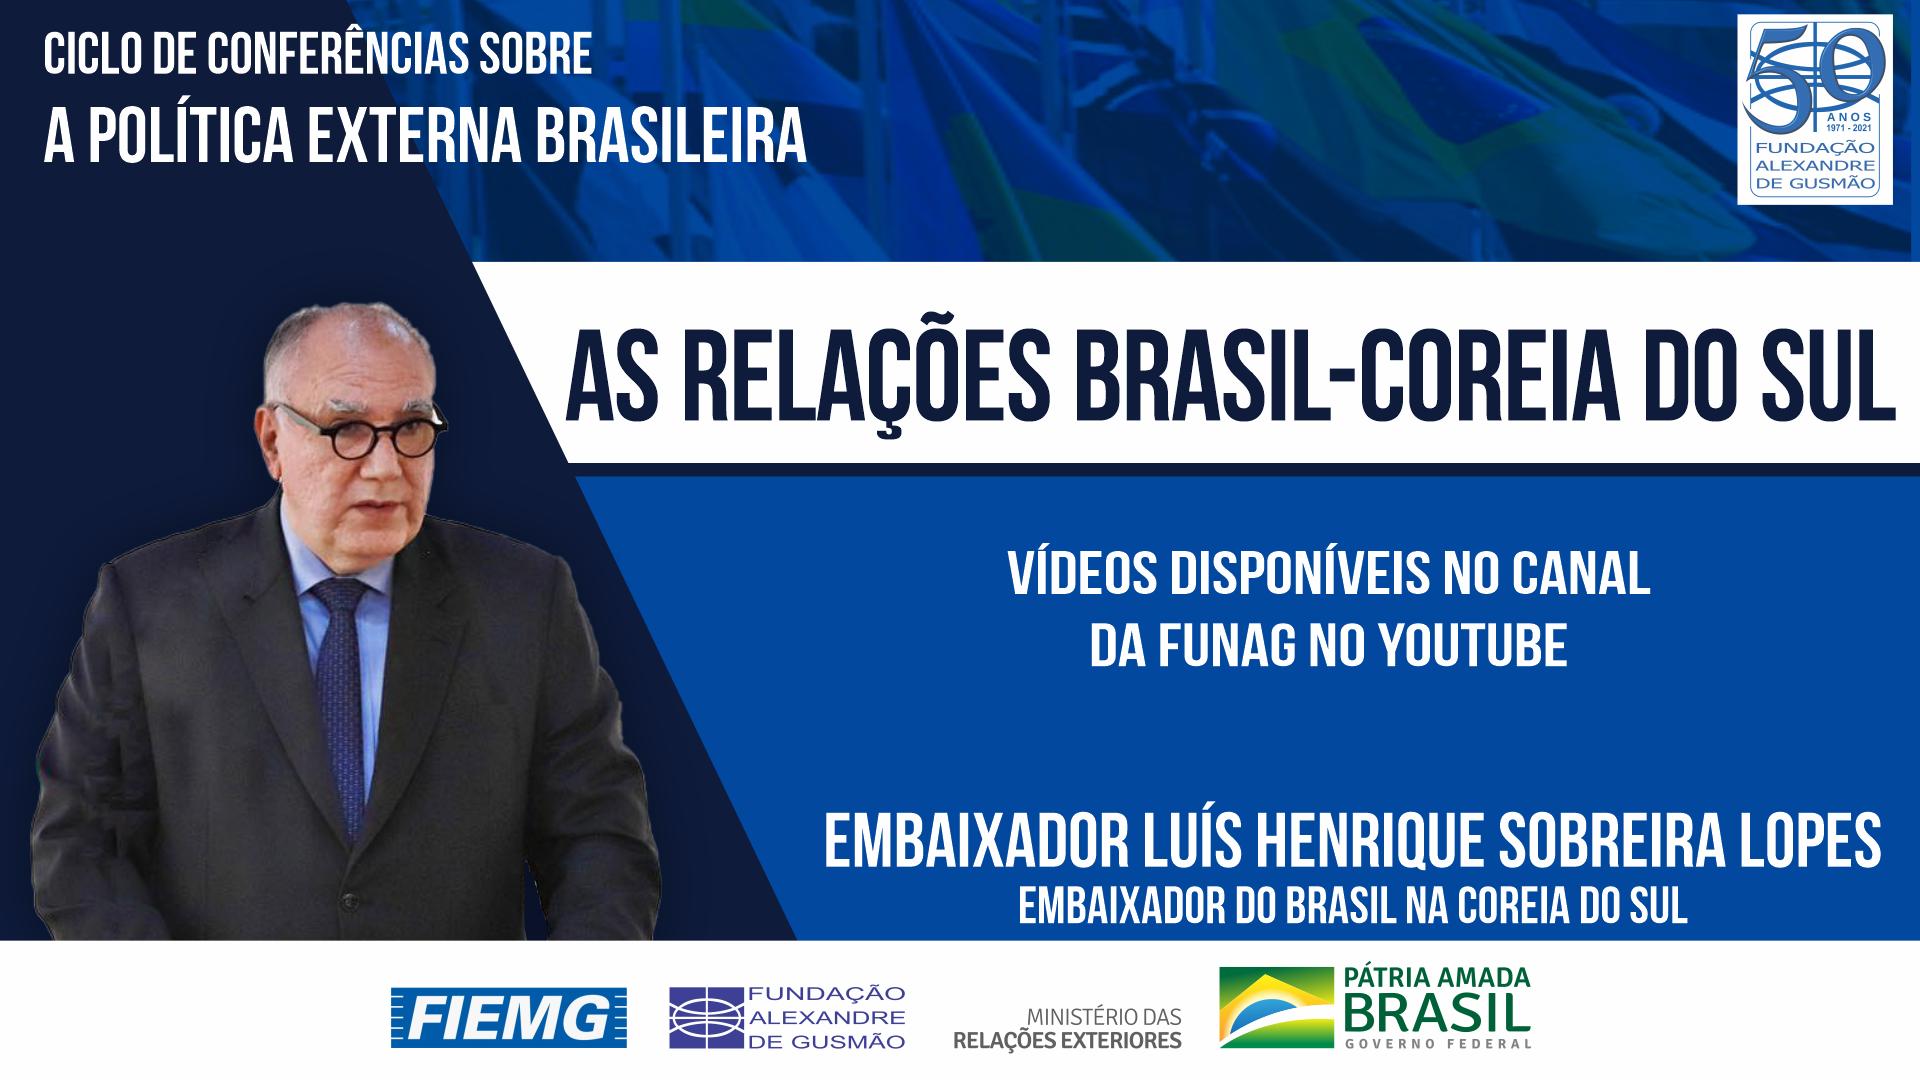 Assista aos vídeos da conferência do Embaixador do Brasil na Coreia do Sul, Luís Henrique Sobreira Lopes